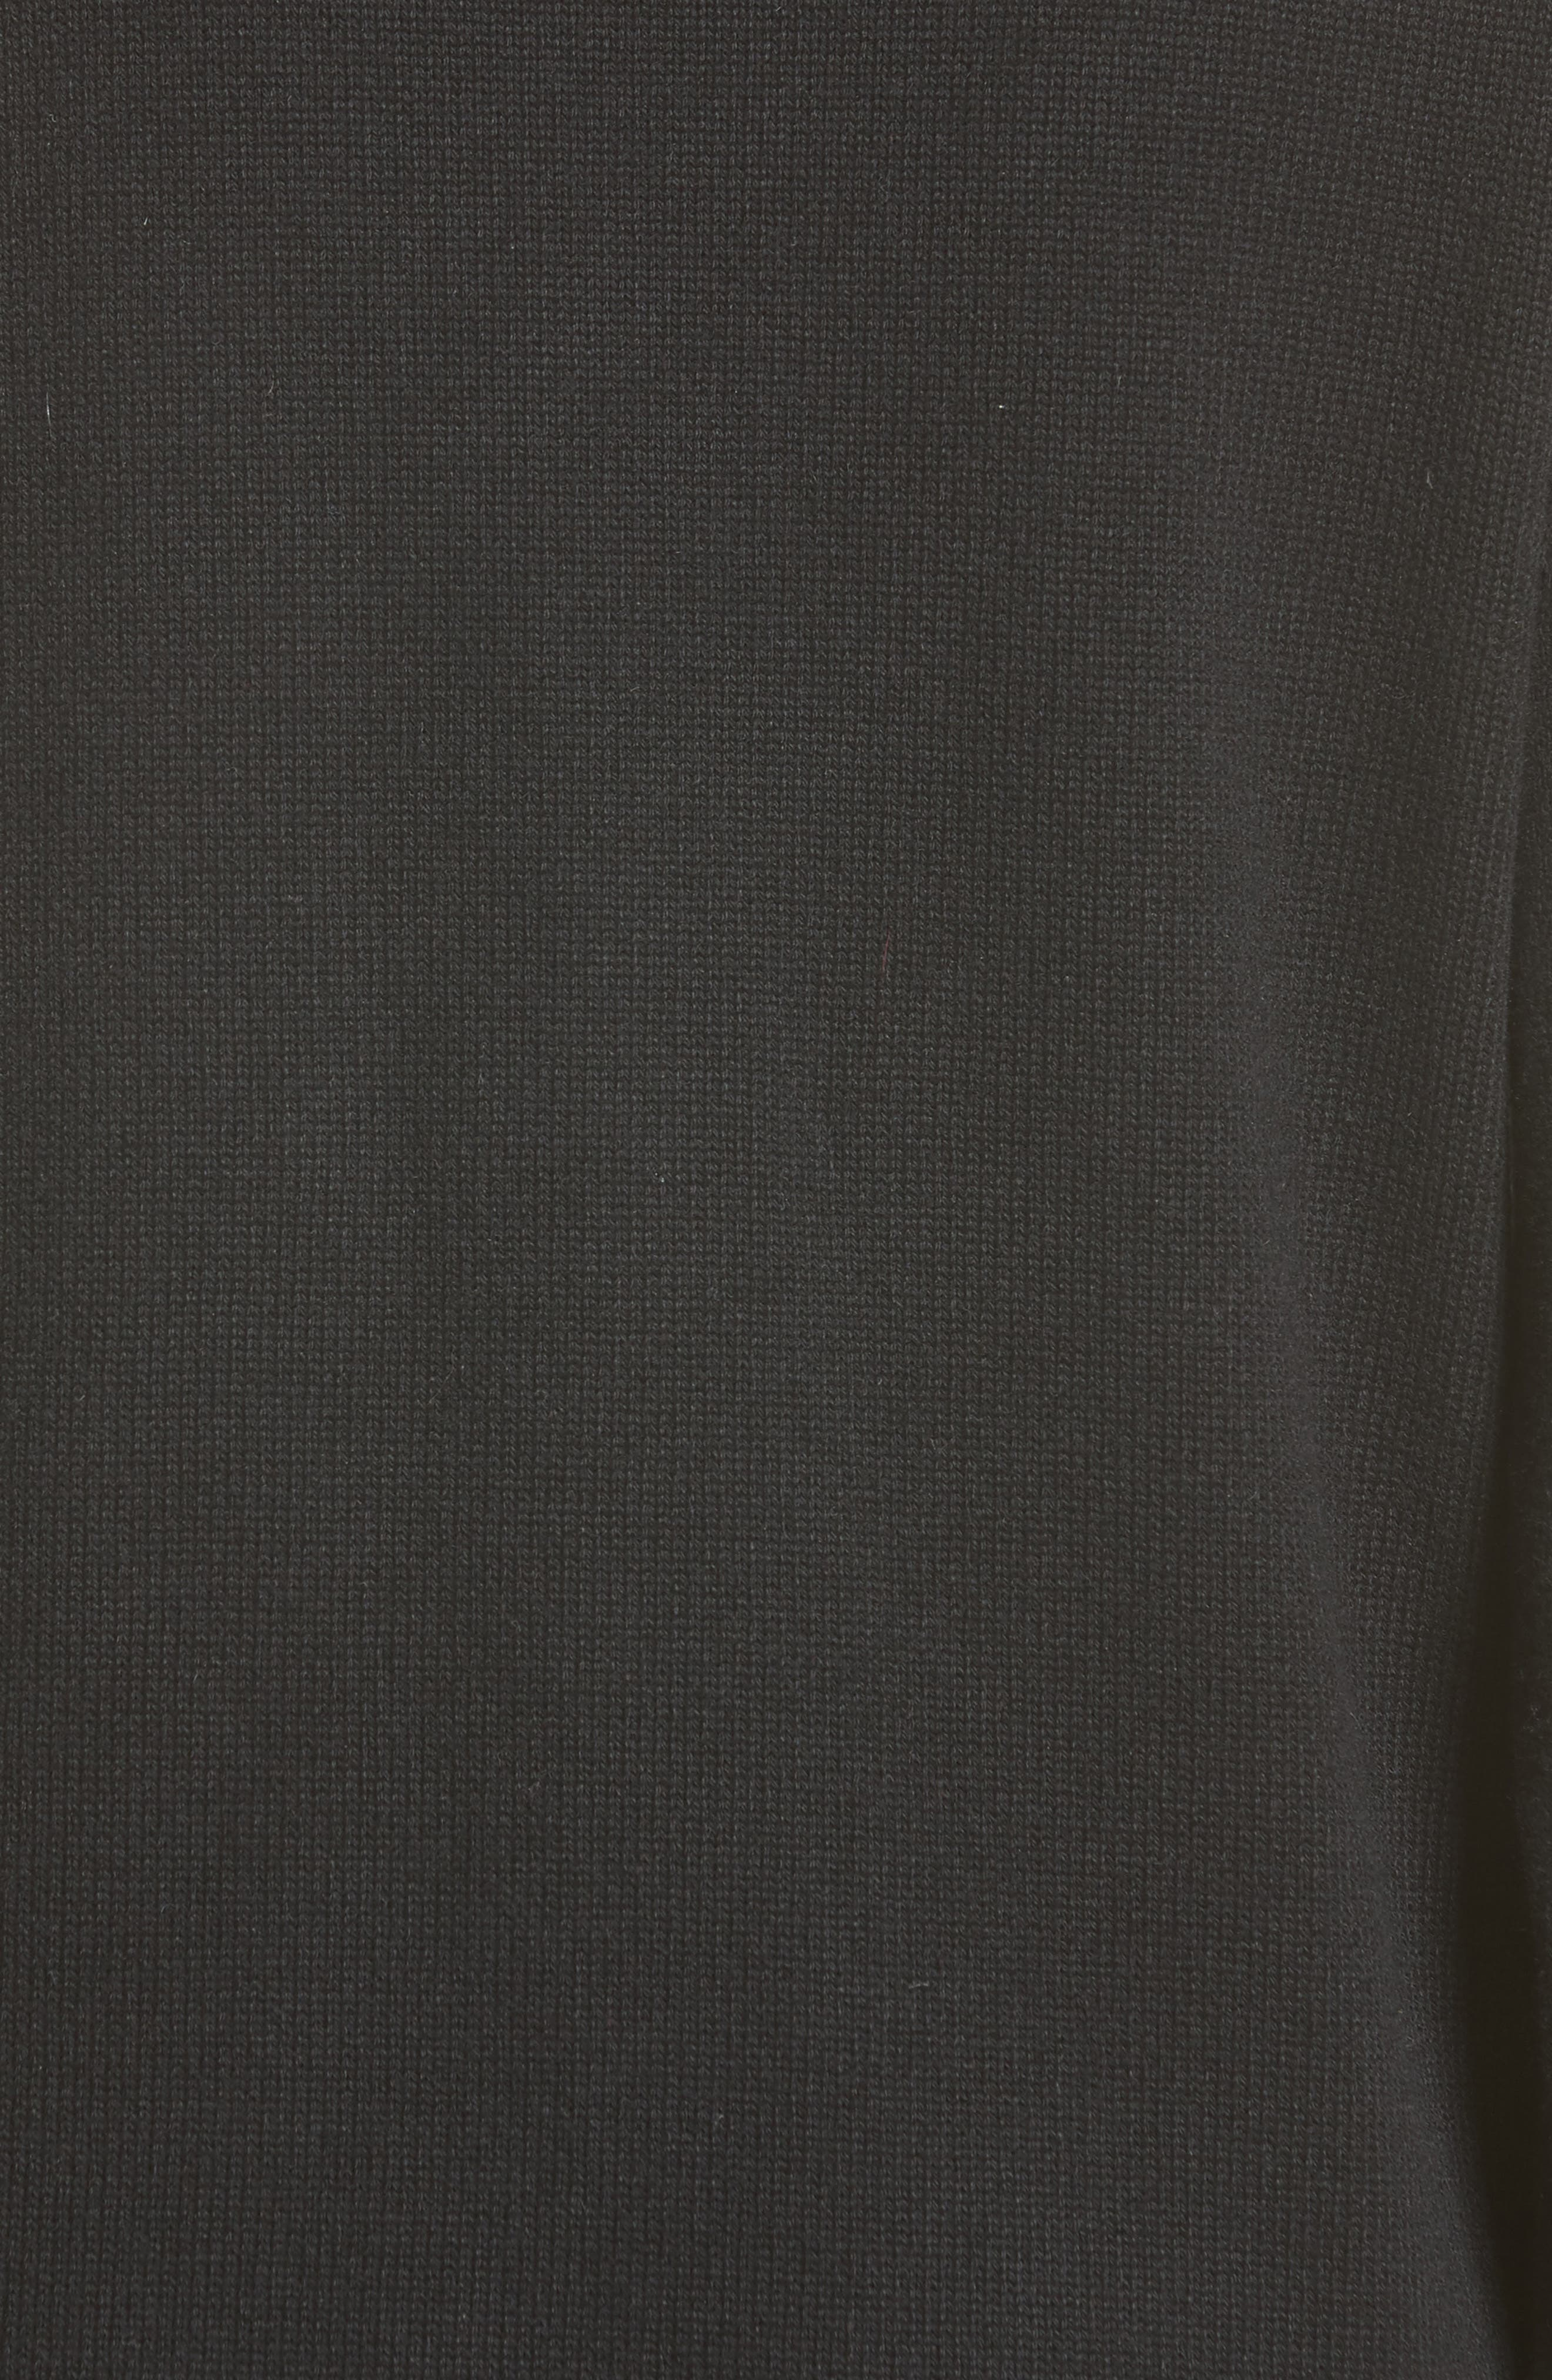 Alternate Image 3  - Michael Kors Zip Detail Cashmere & Cotton Sweater